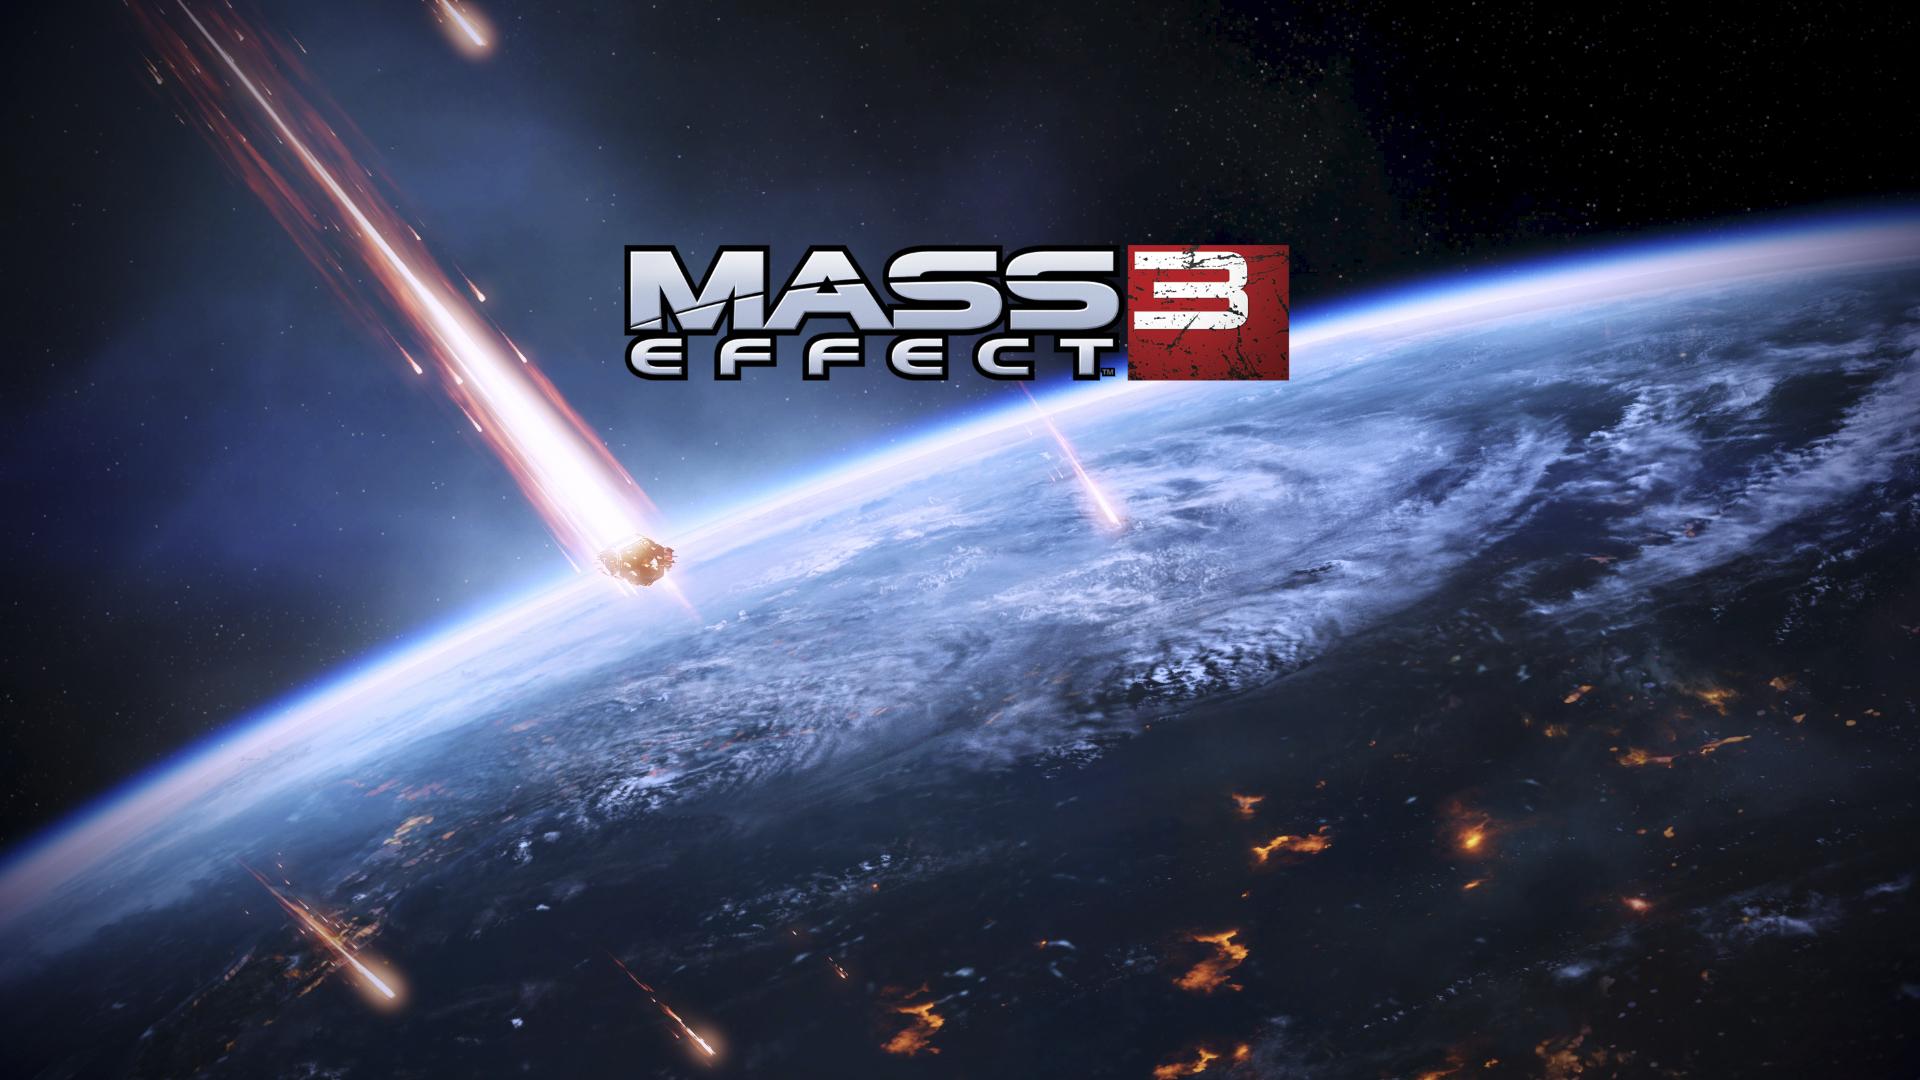 Mass Effect 3 Title Wallpaper by BlackScarletLove on ...